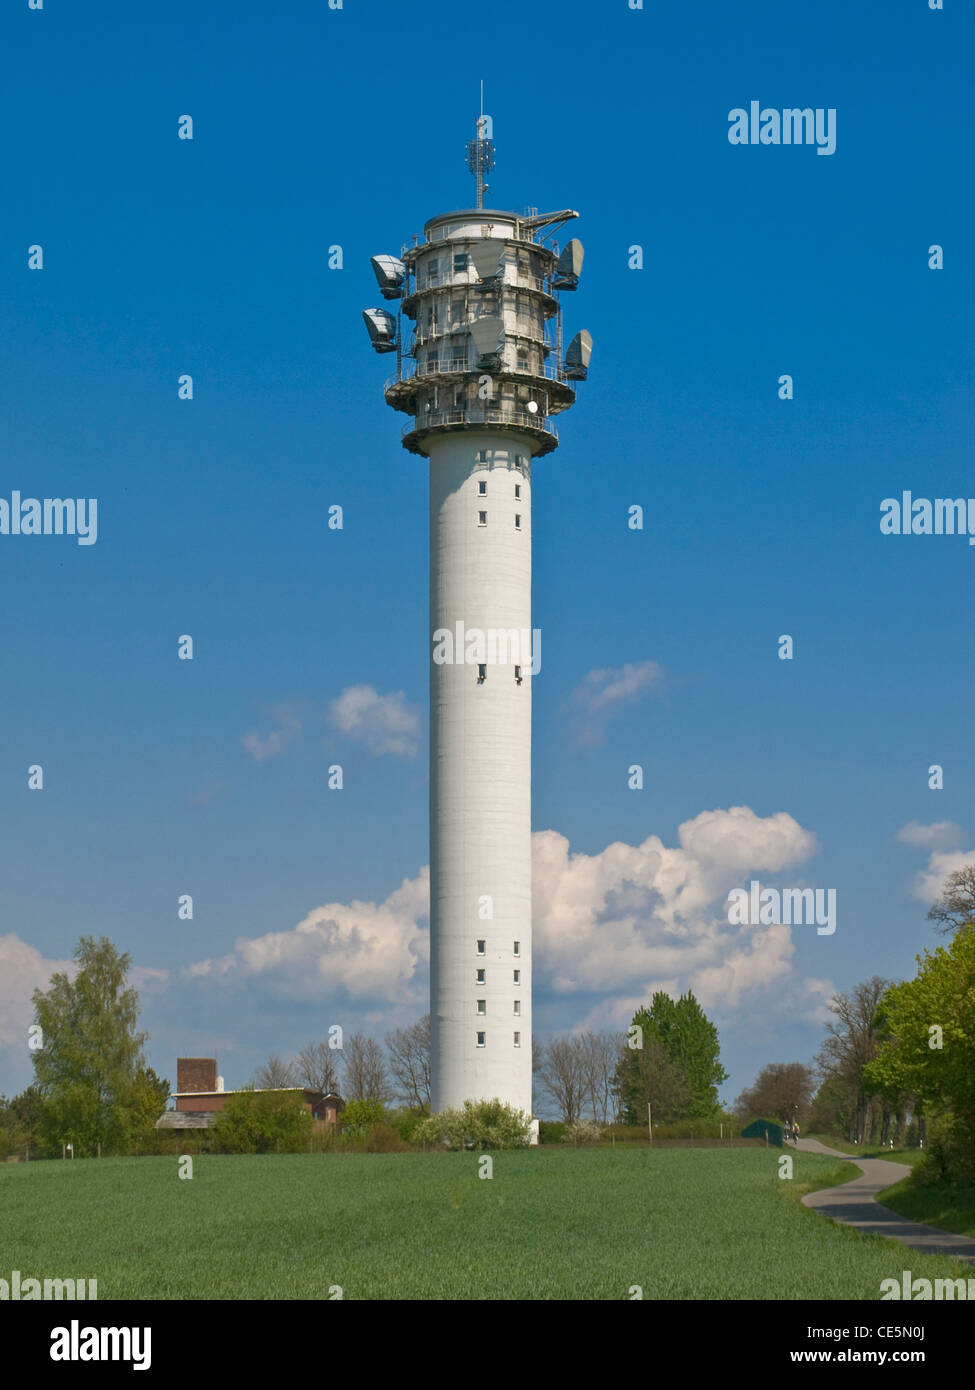 Radio tower, Petkus, administrative district Teltow-Flaeming, Brandenburg, Germany, Europe - Stock Image